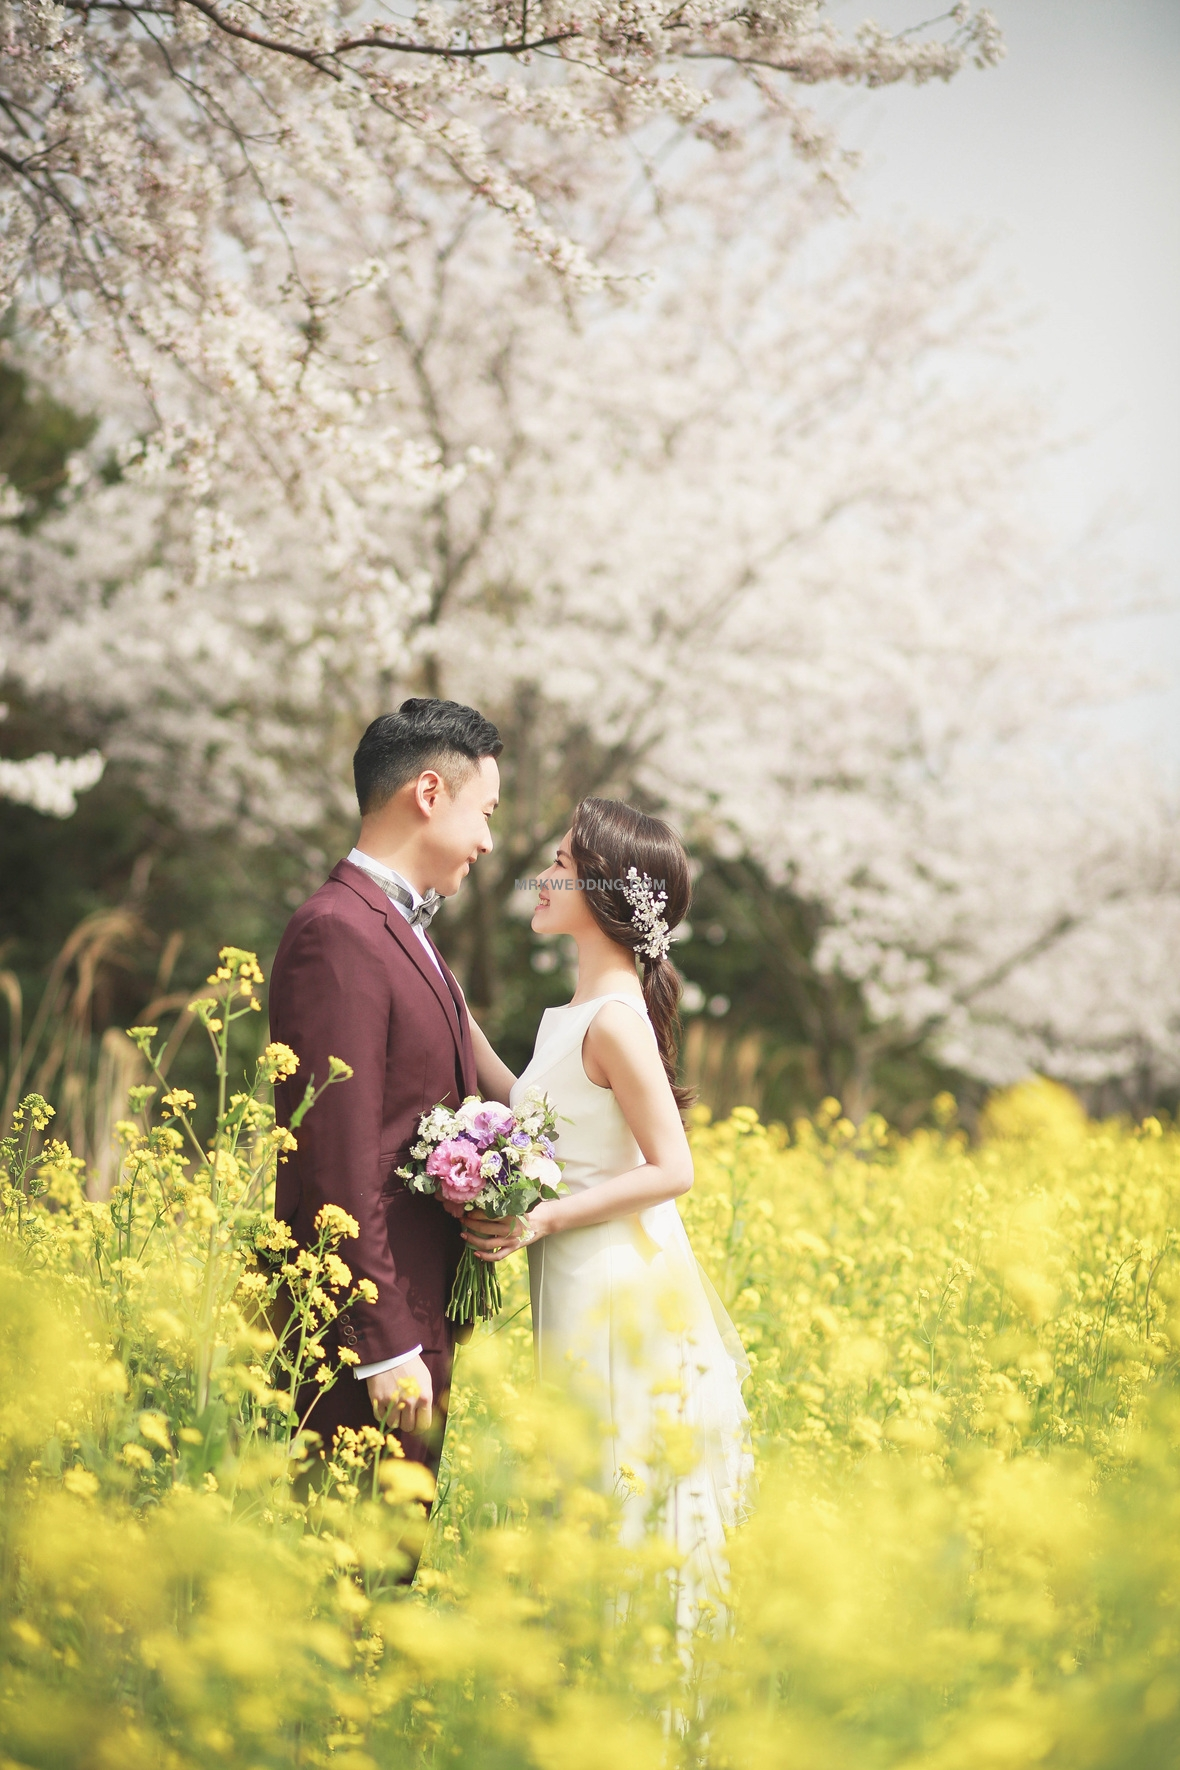 MrK Korea Wedding (25).jpg